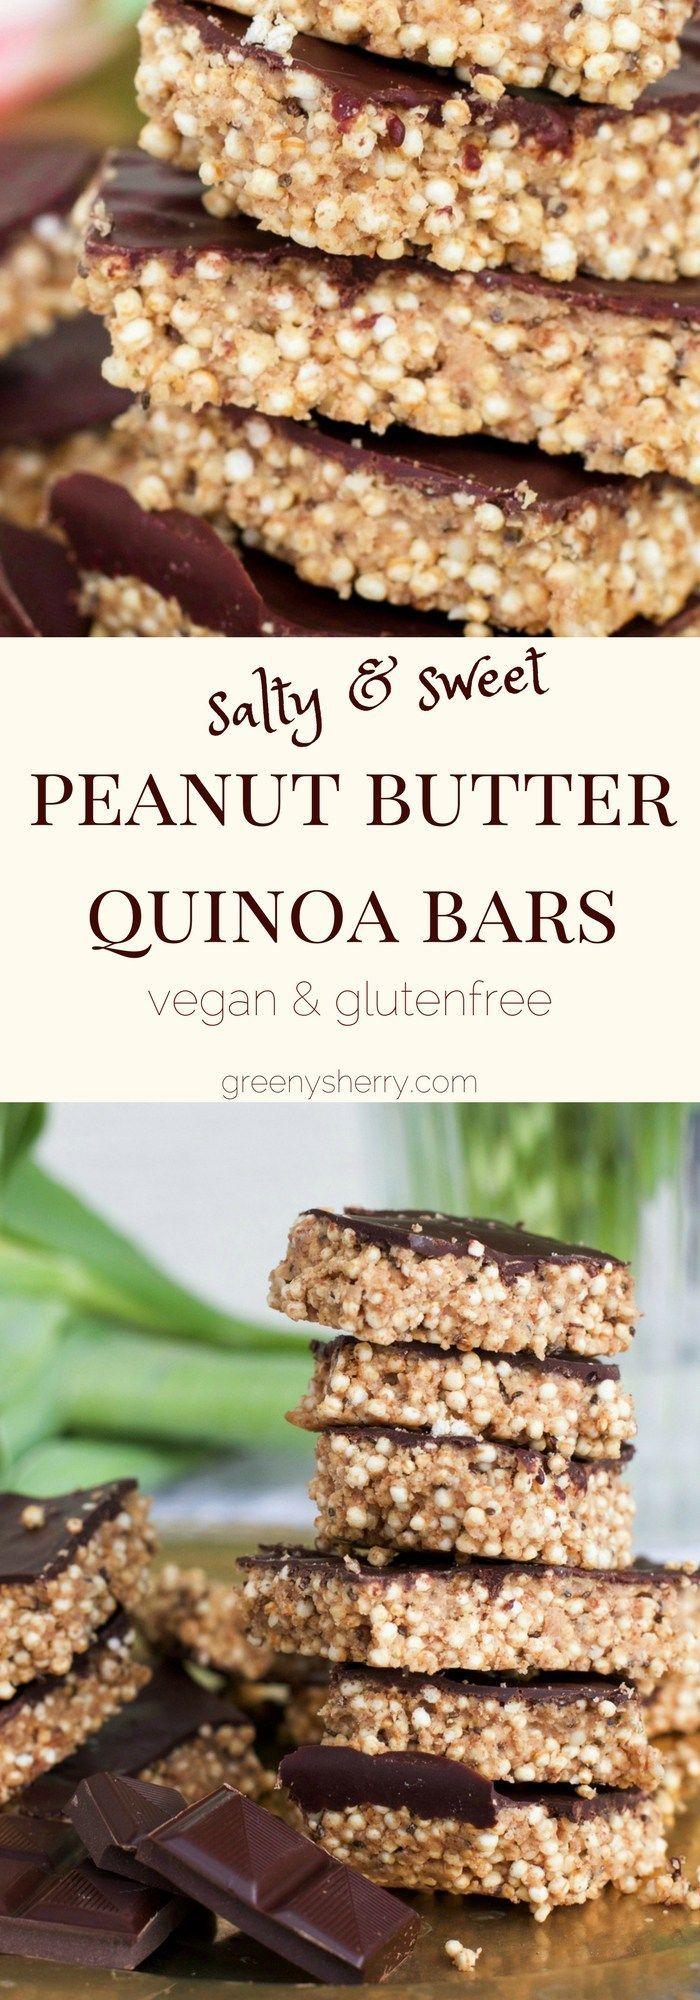 Salty peanut butter quinoa-chia bars with chocolate (vegan & glutenfree) www.greenysherry.com